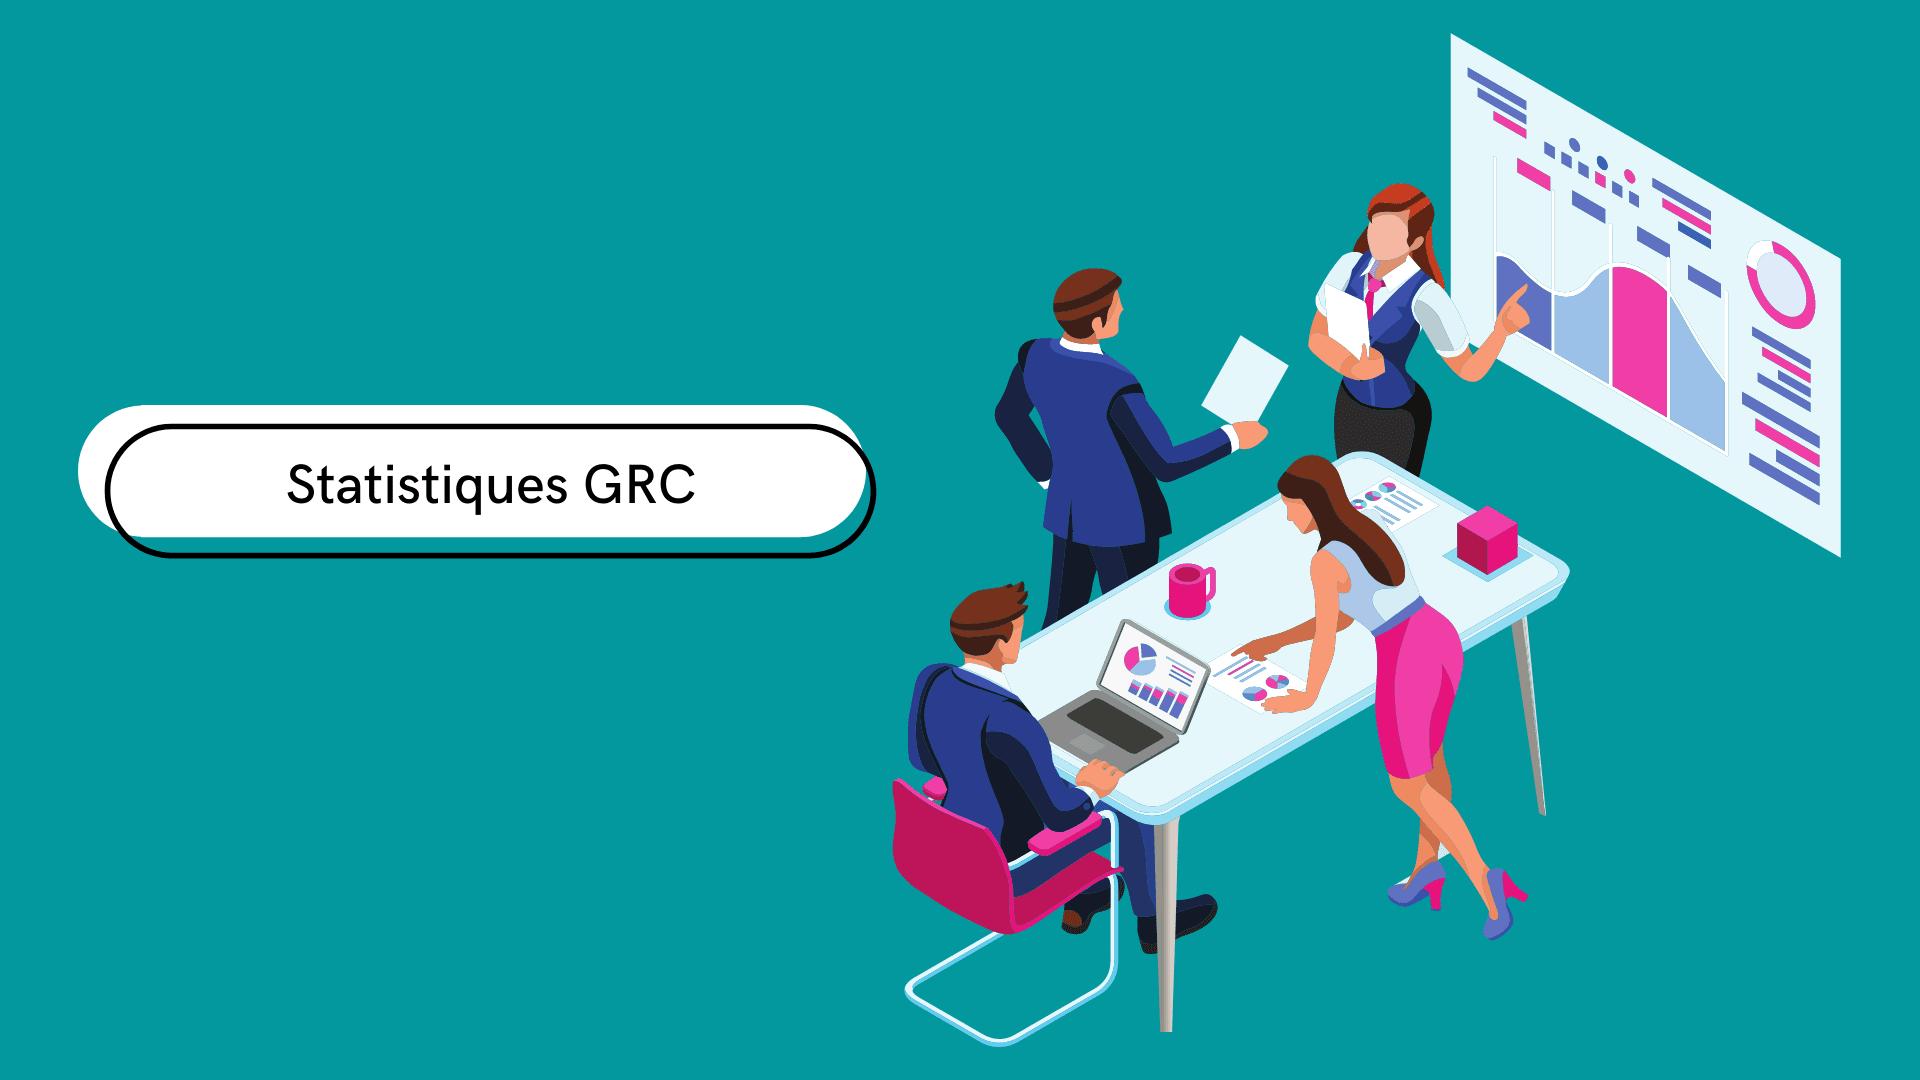 Statistiques logiciels GRC